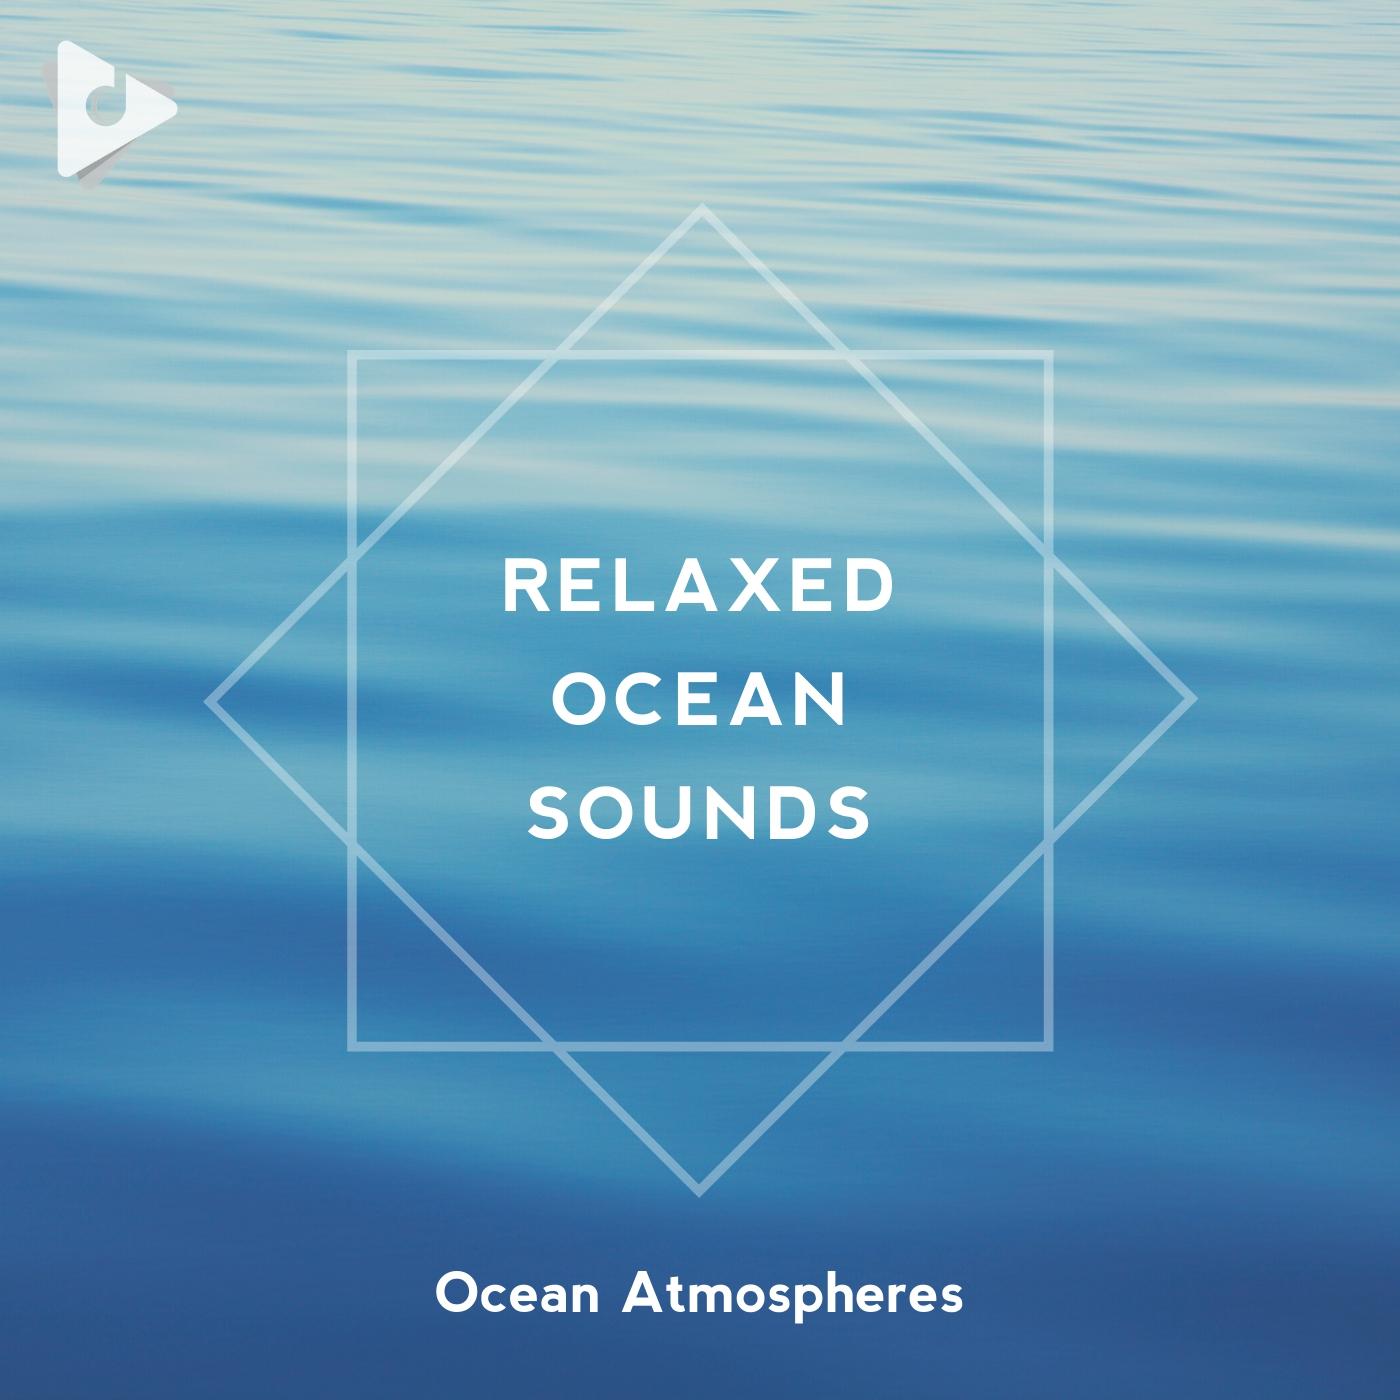 Relaxed Ocean Sounds